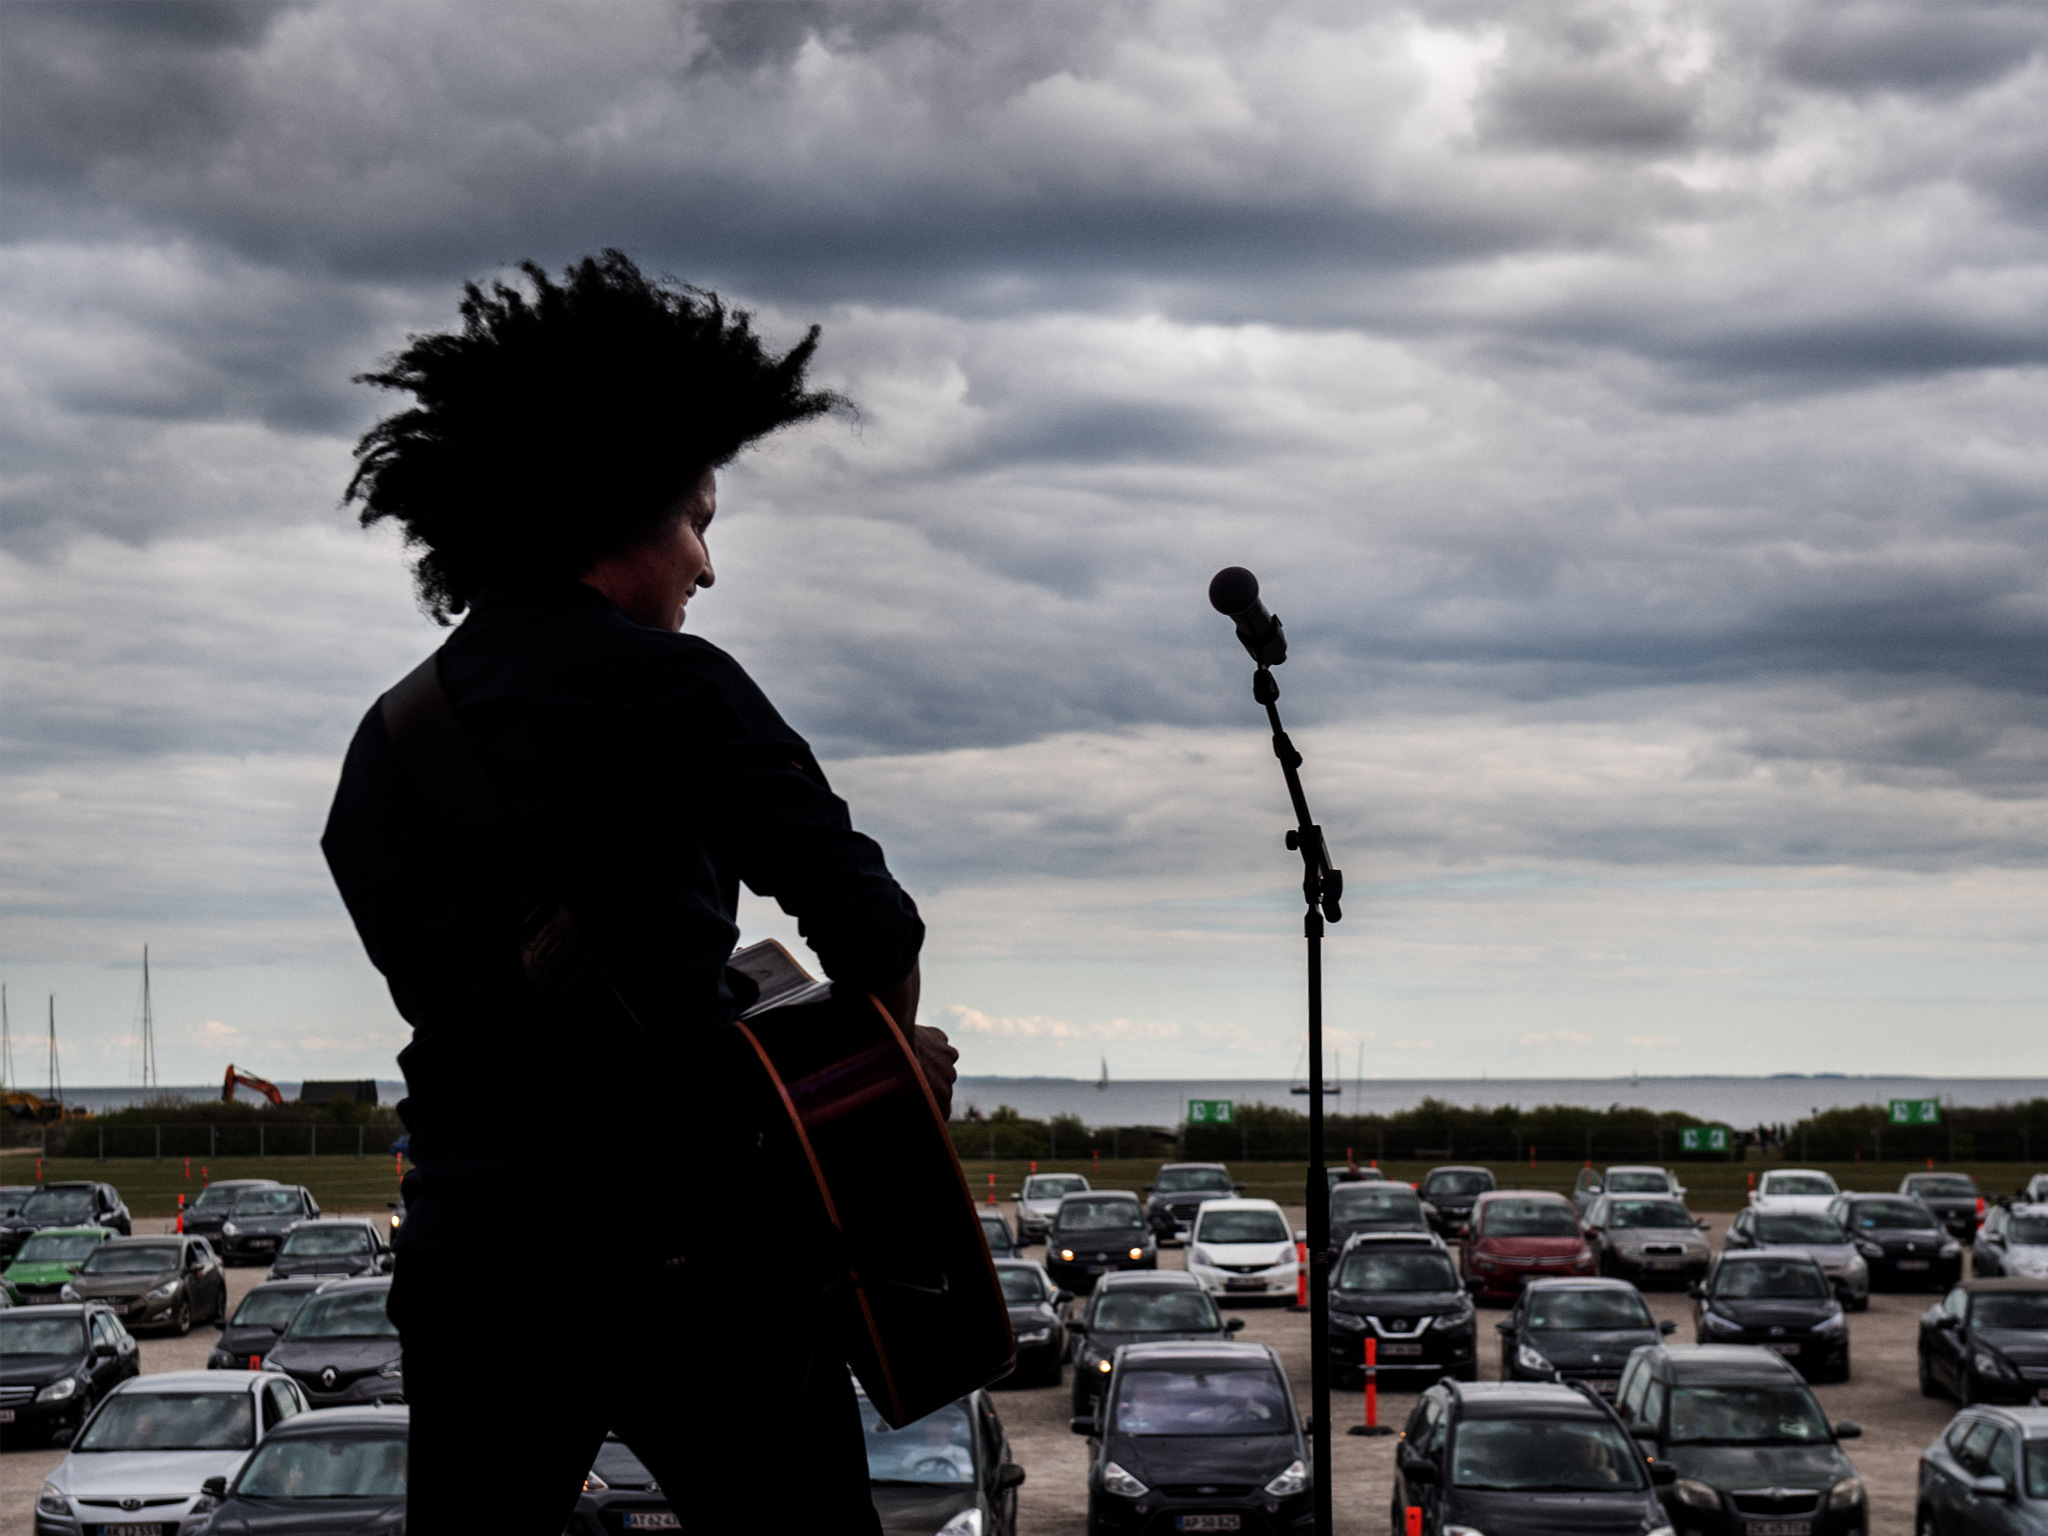 Thomas Buttenschøn performs a drive-in concert in Aarhus, Denmark